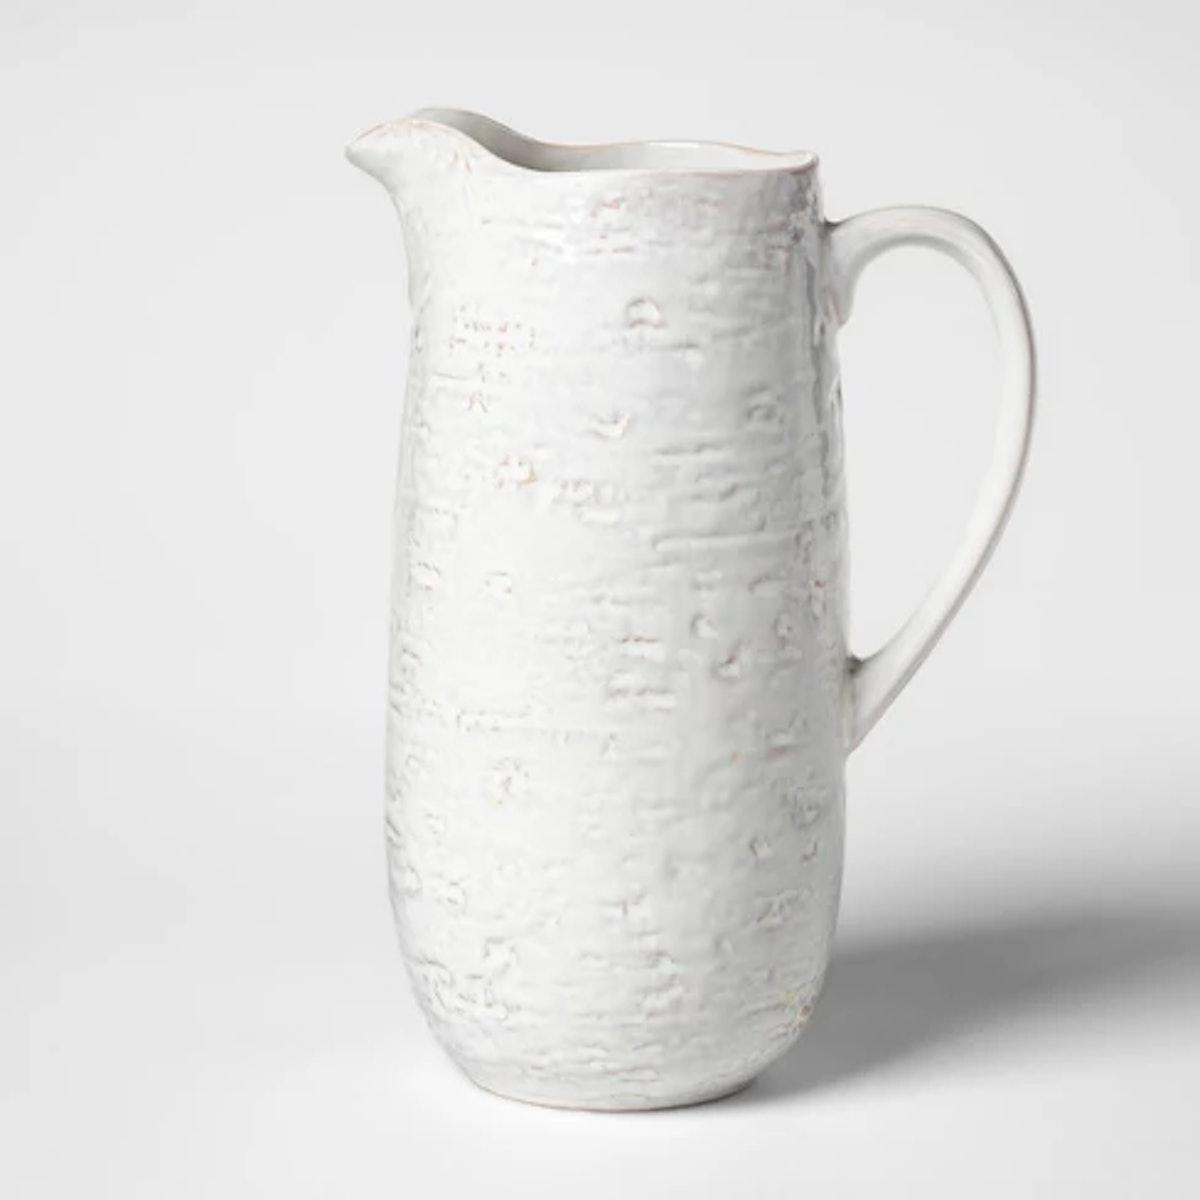 Cravings by Chrissy Teigen 2.1qt Stoneware Pitcher White